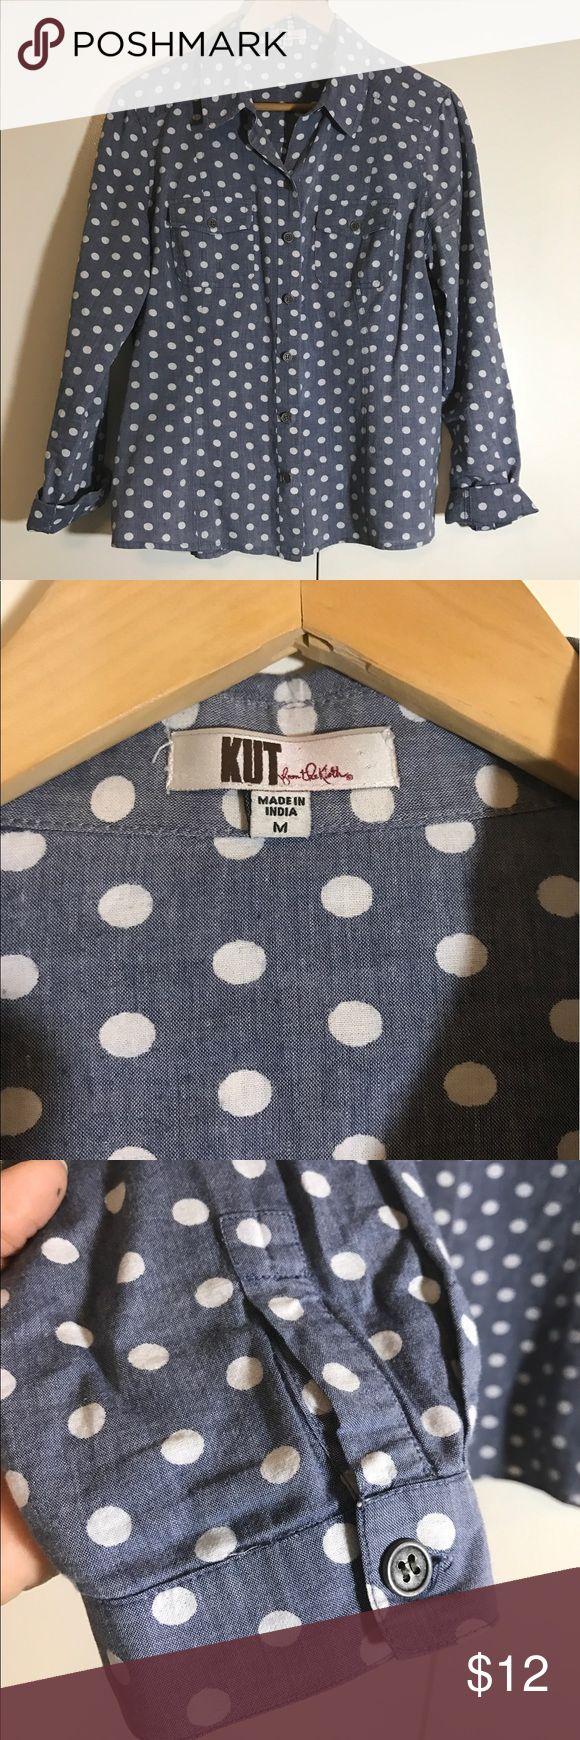 Kut polka dot shirt Pre loved kut Tops Sweatshirts & Hoodies